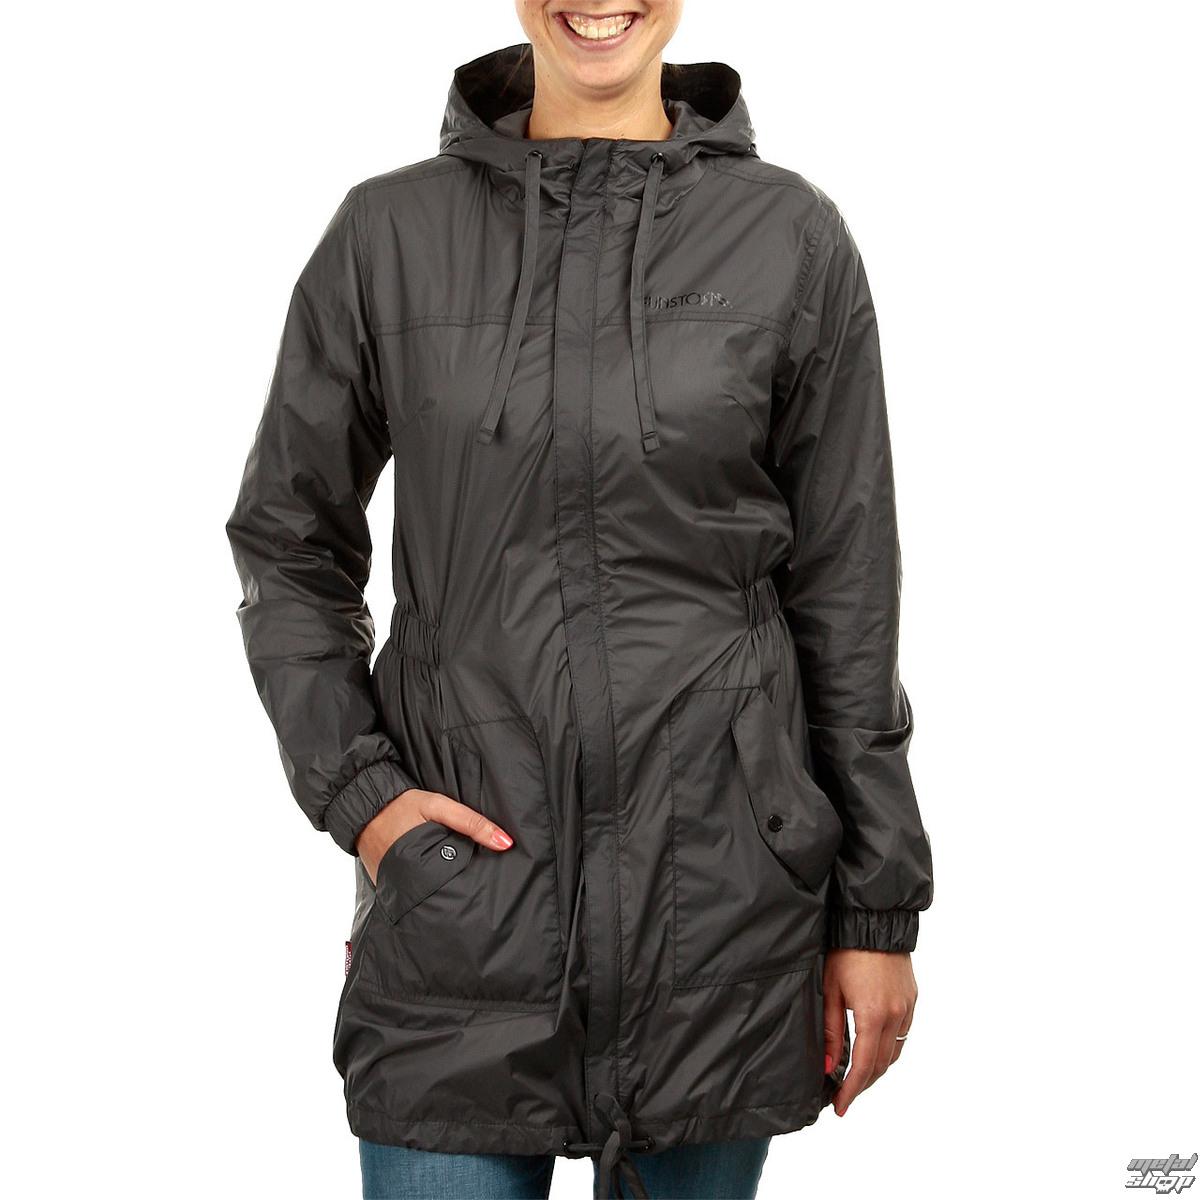 bunda dámska -kabátik- jarno-jesenná FUNSTORM - Munfe - 20 D GREY